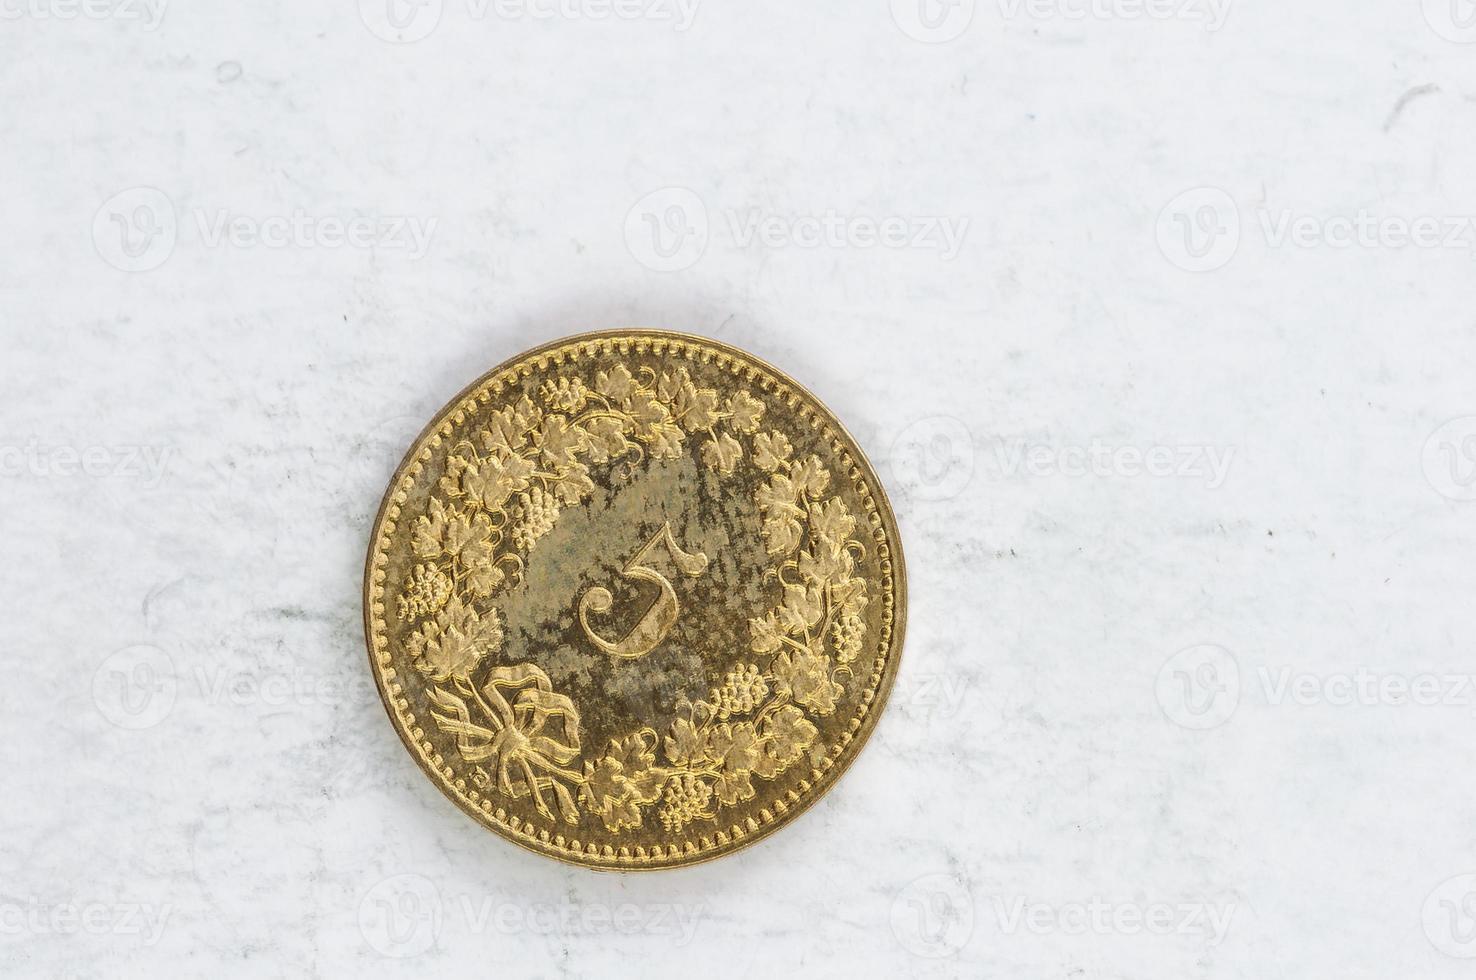 5 schweizer confoederatio helvetica münze silber foto